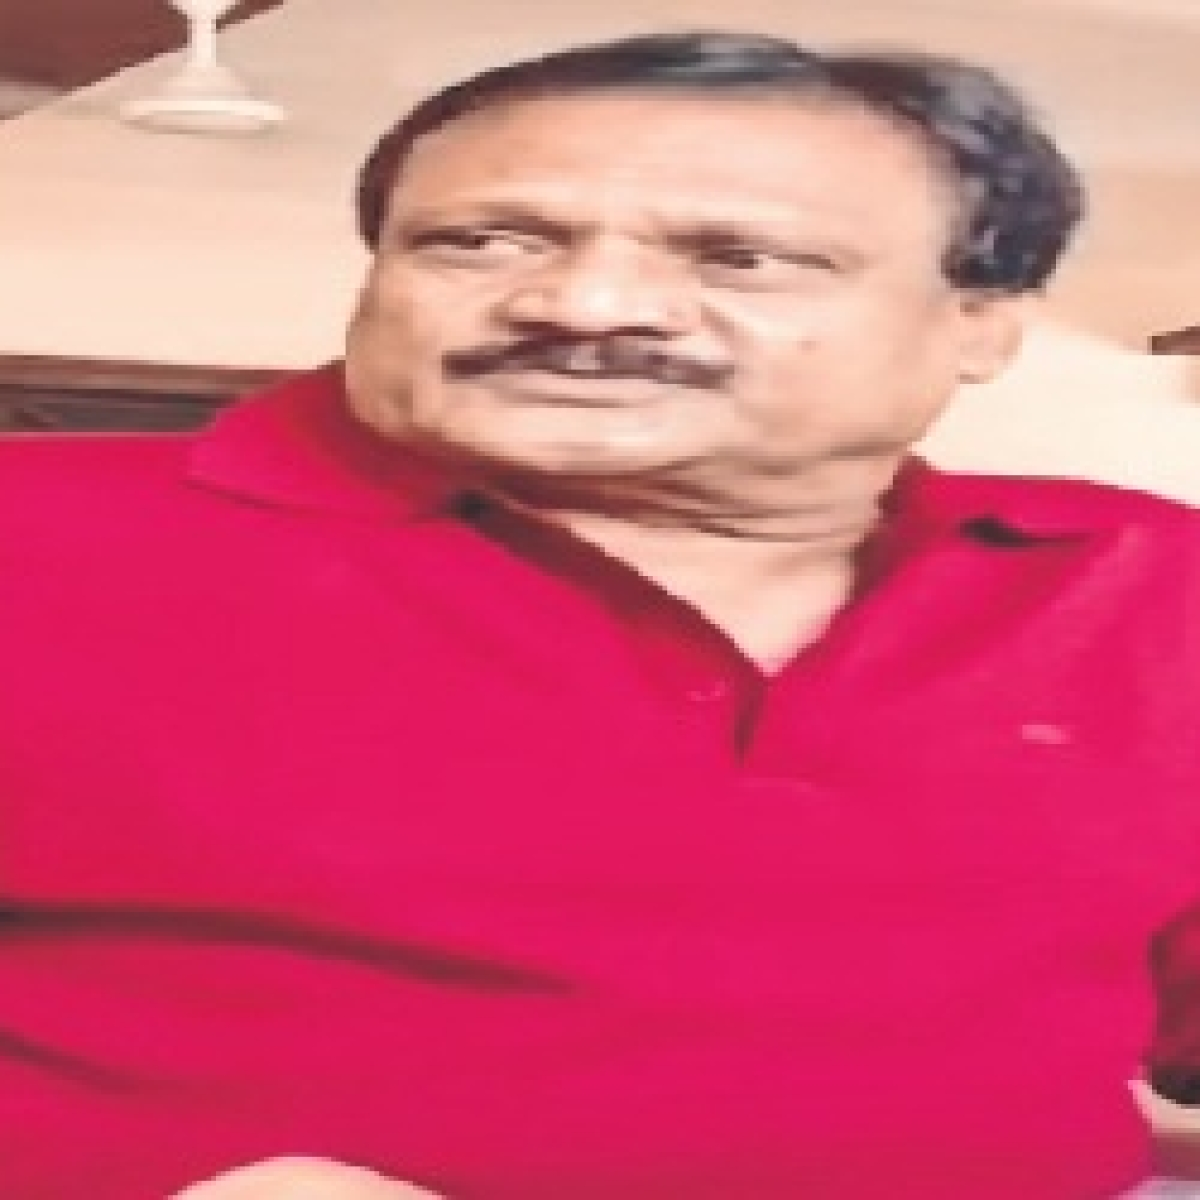 Bhopal: Sajjan criticises Diggy's tweet over stray cows